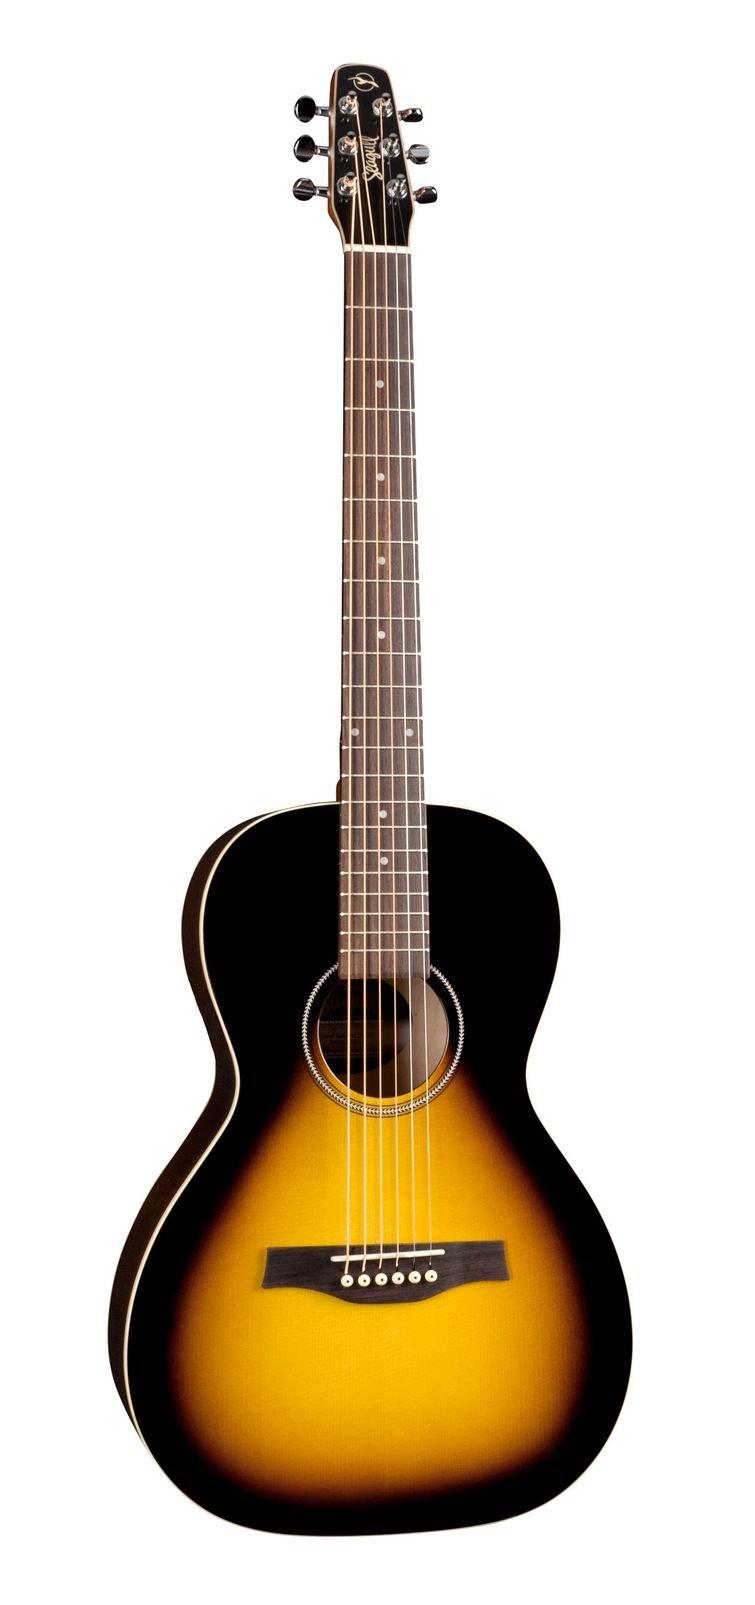 Get Quotations · Godin Guitars 040209 Seagull Grand Sunburst Acoustic Guitar